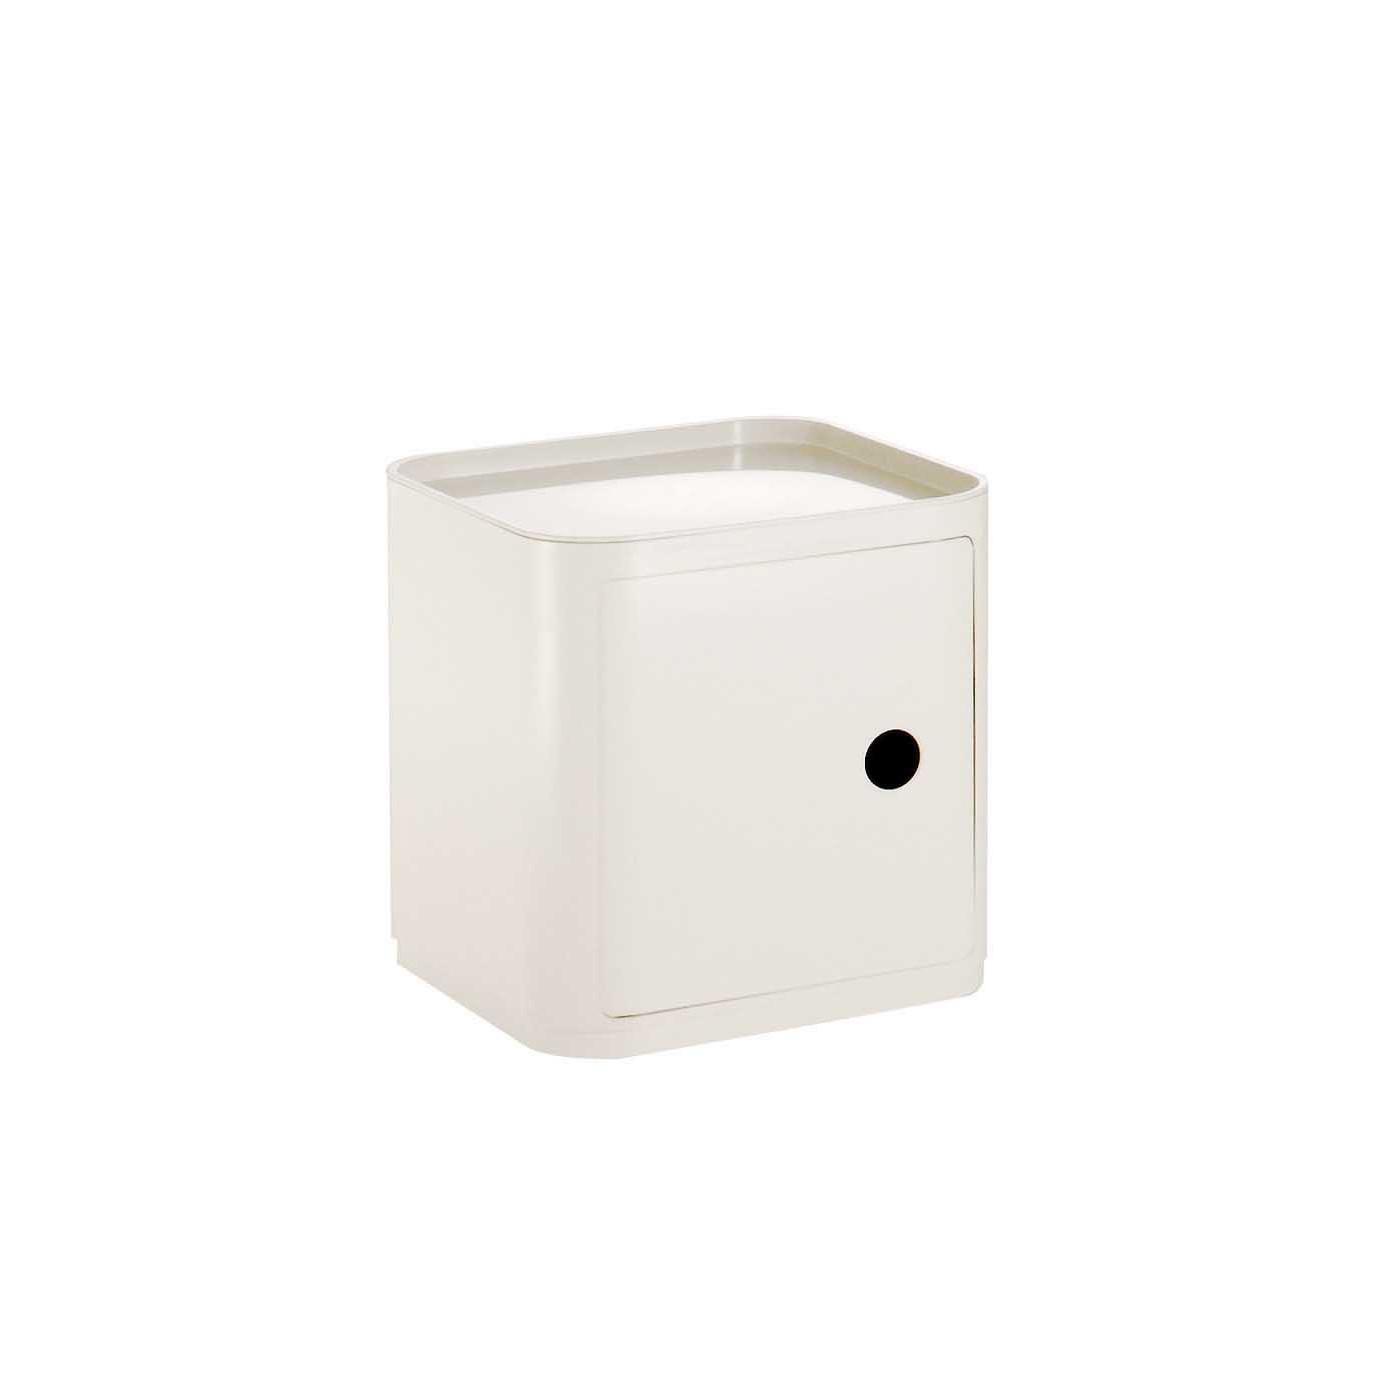 Kartell Componibili module, one shelf, square